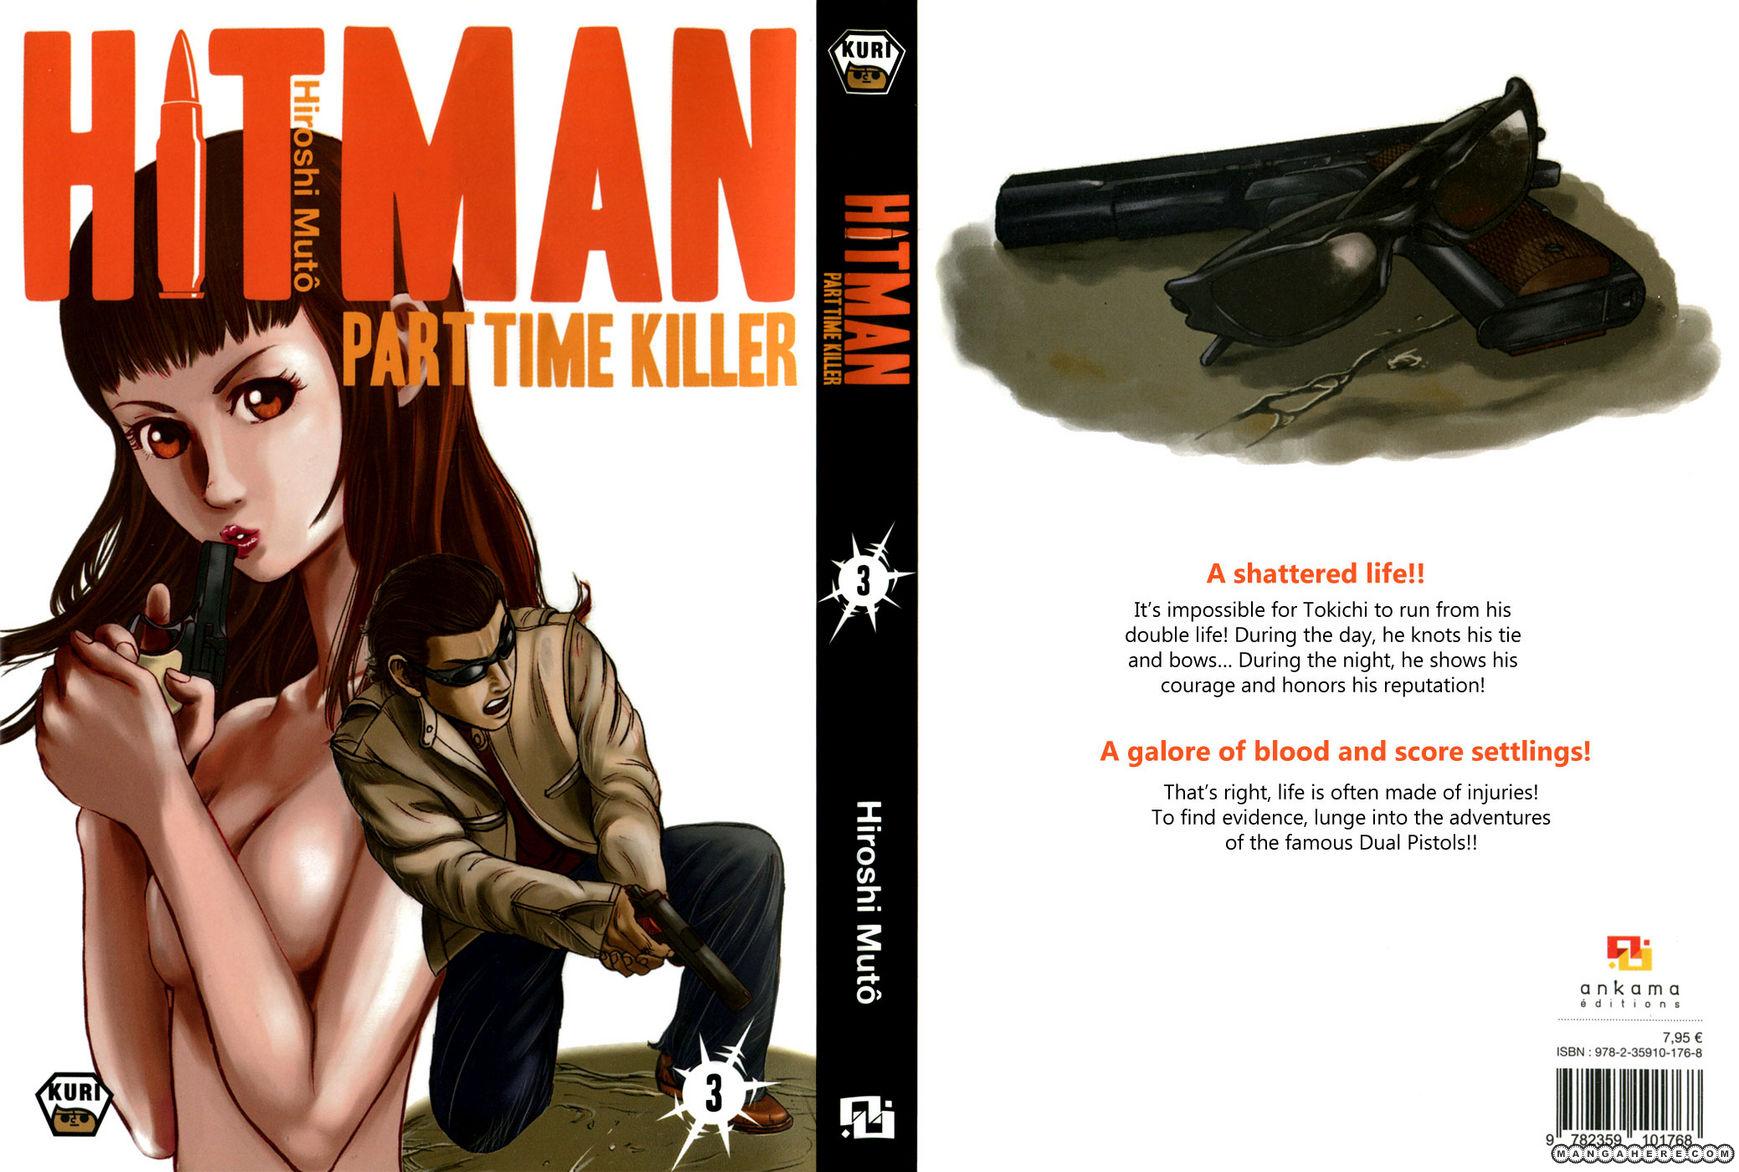 Kyou Kara Hitman 17 Page 1